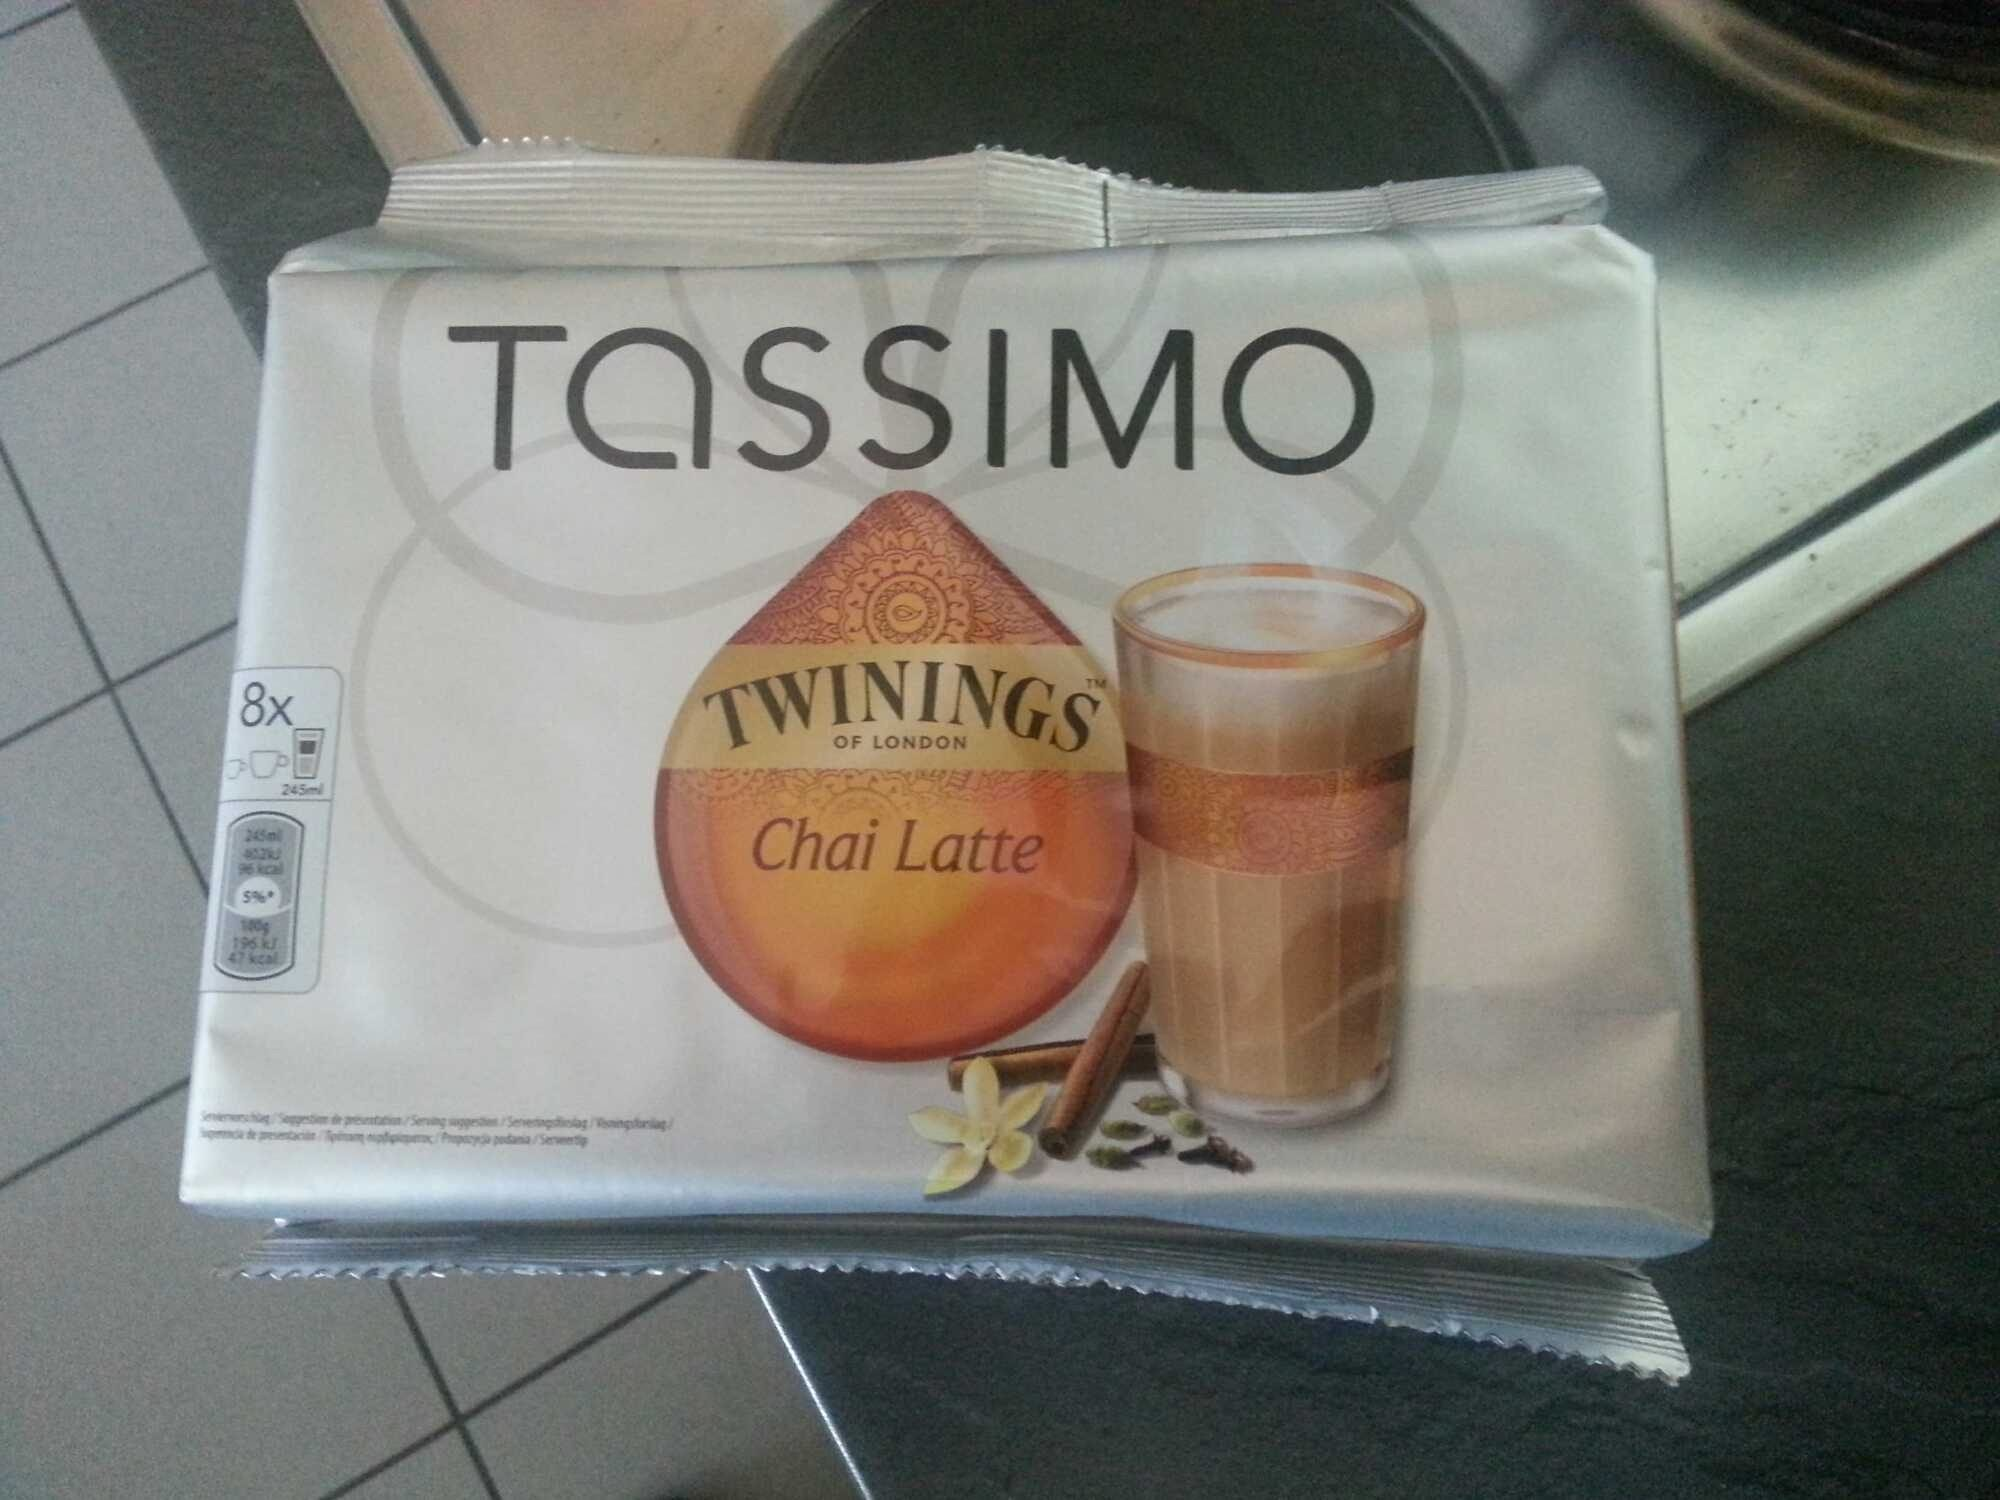 Twinnings Chai Latte - Tassimo - 8